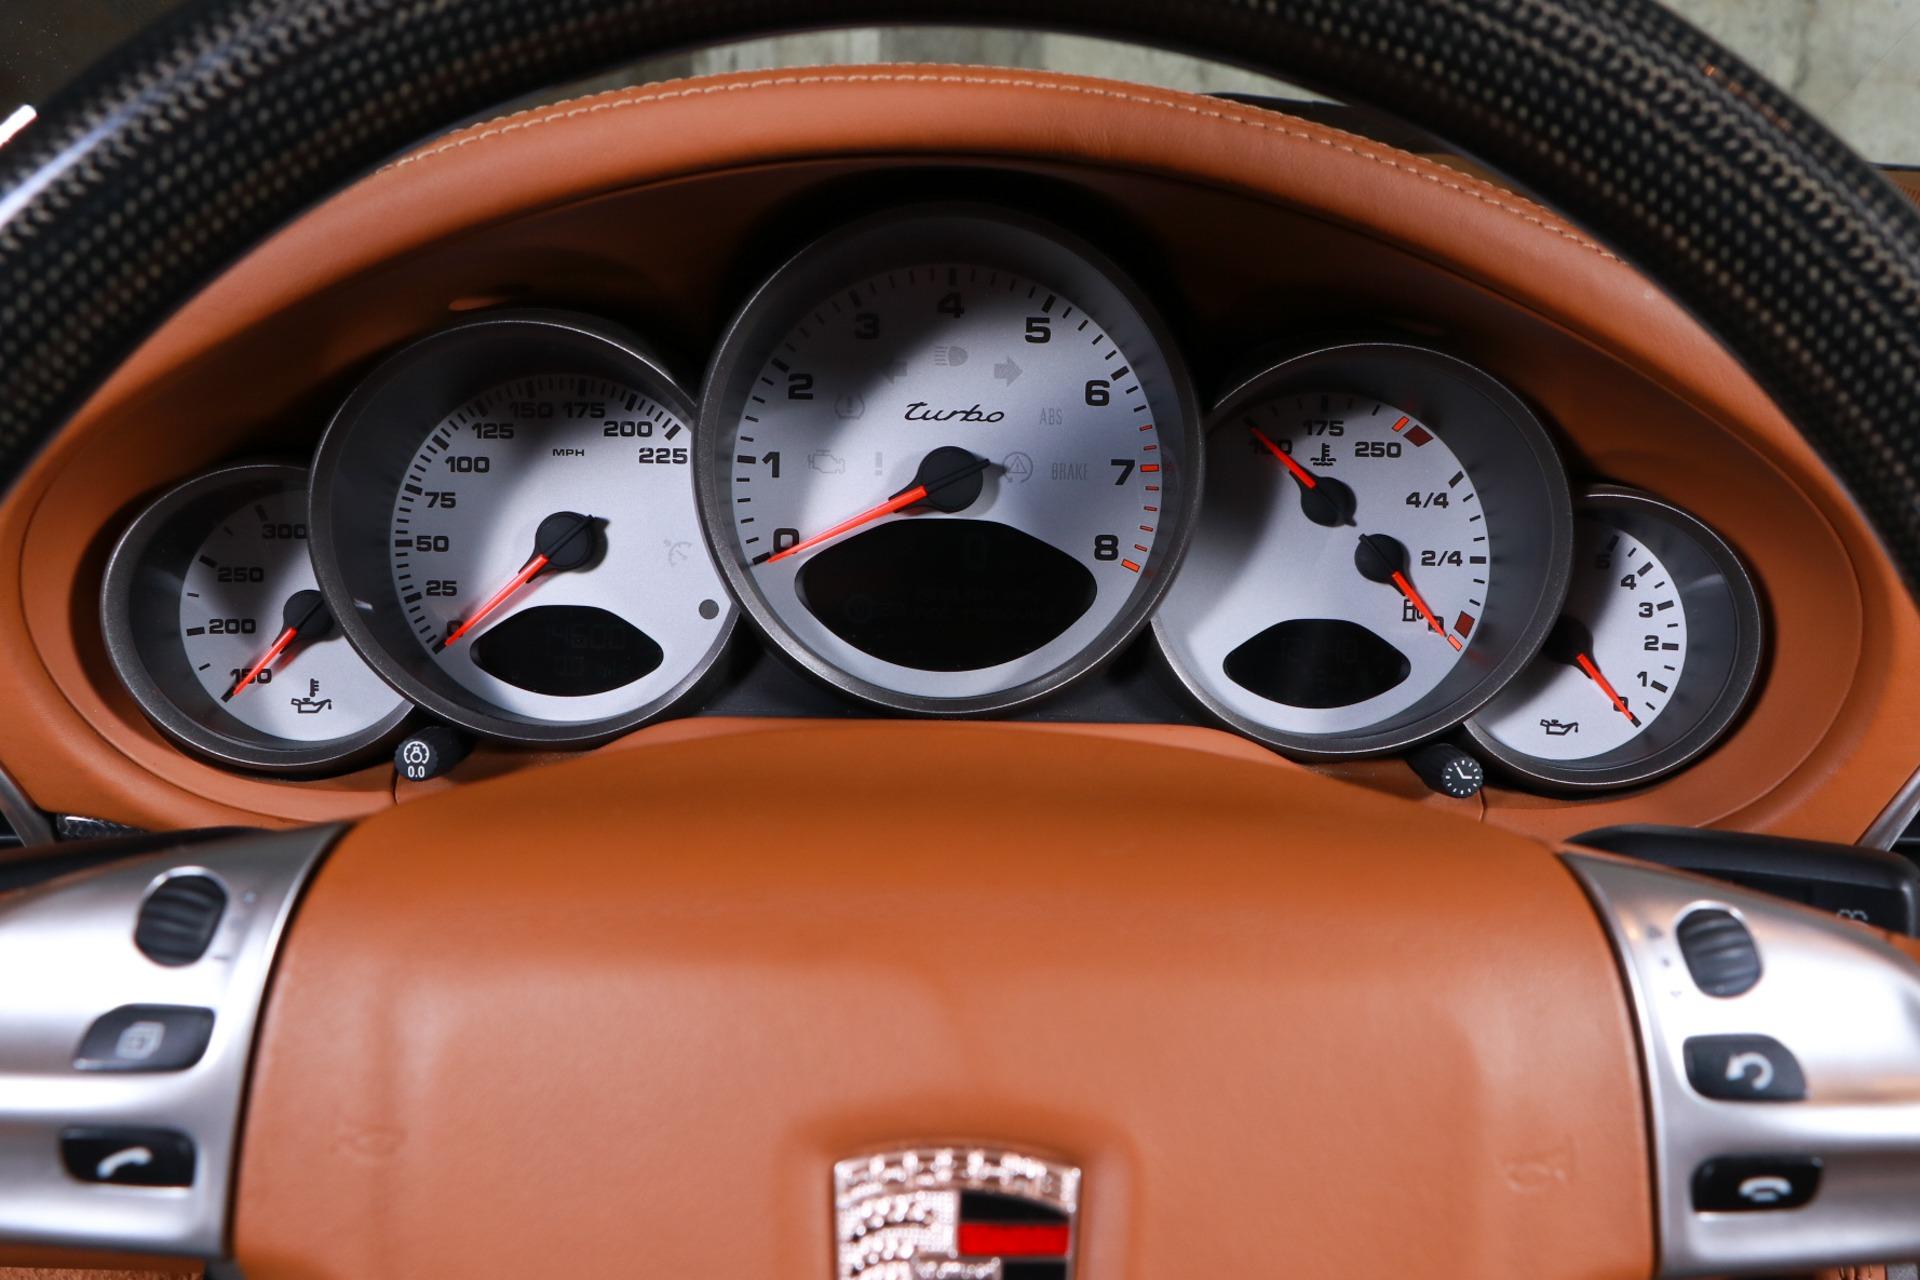 Used 2008 Porsche 911 Turbo Cabriolet | Glen Cove, NY